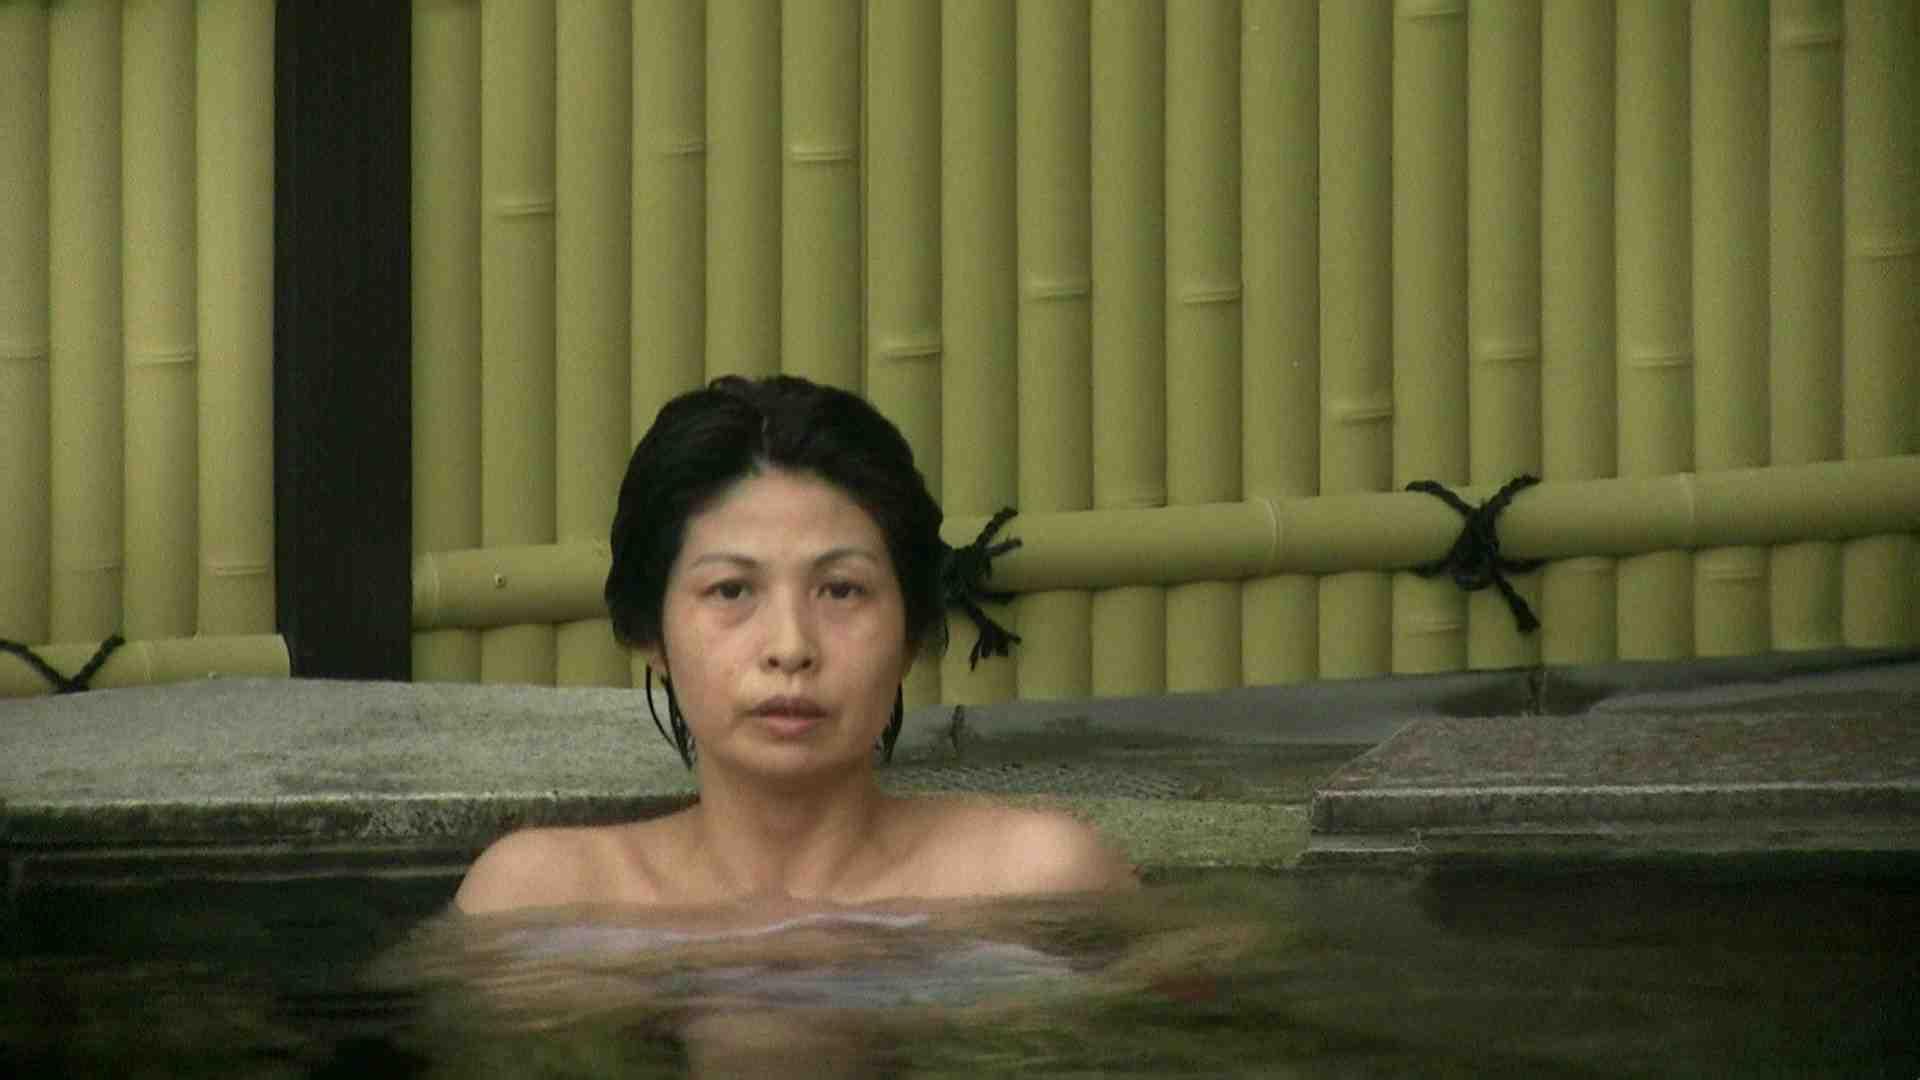 Aquaな露天風呂Vol.636 HなOL | 盗撮  82pic 1